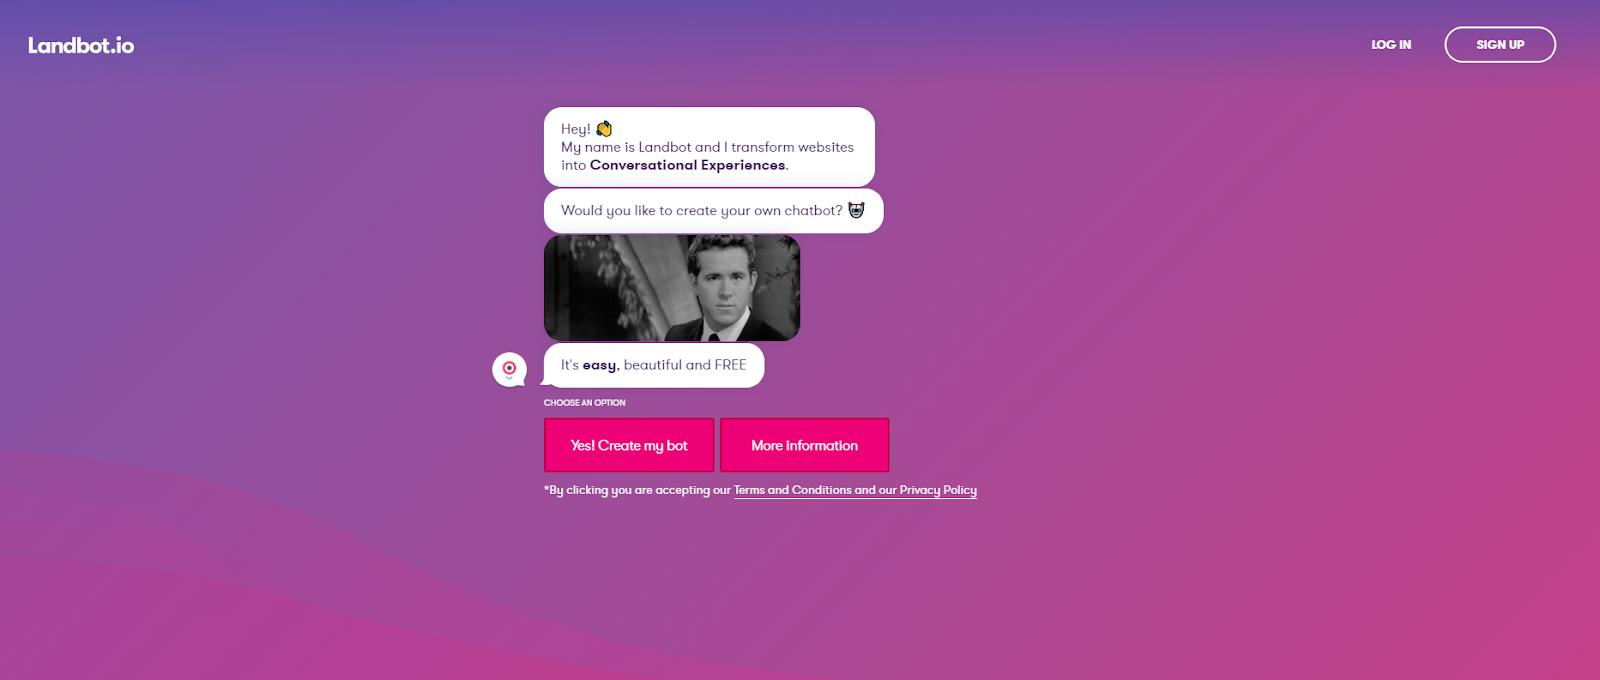 Landpot homepage